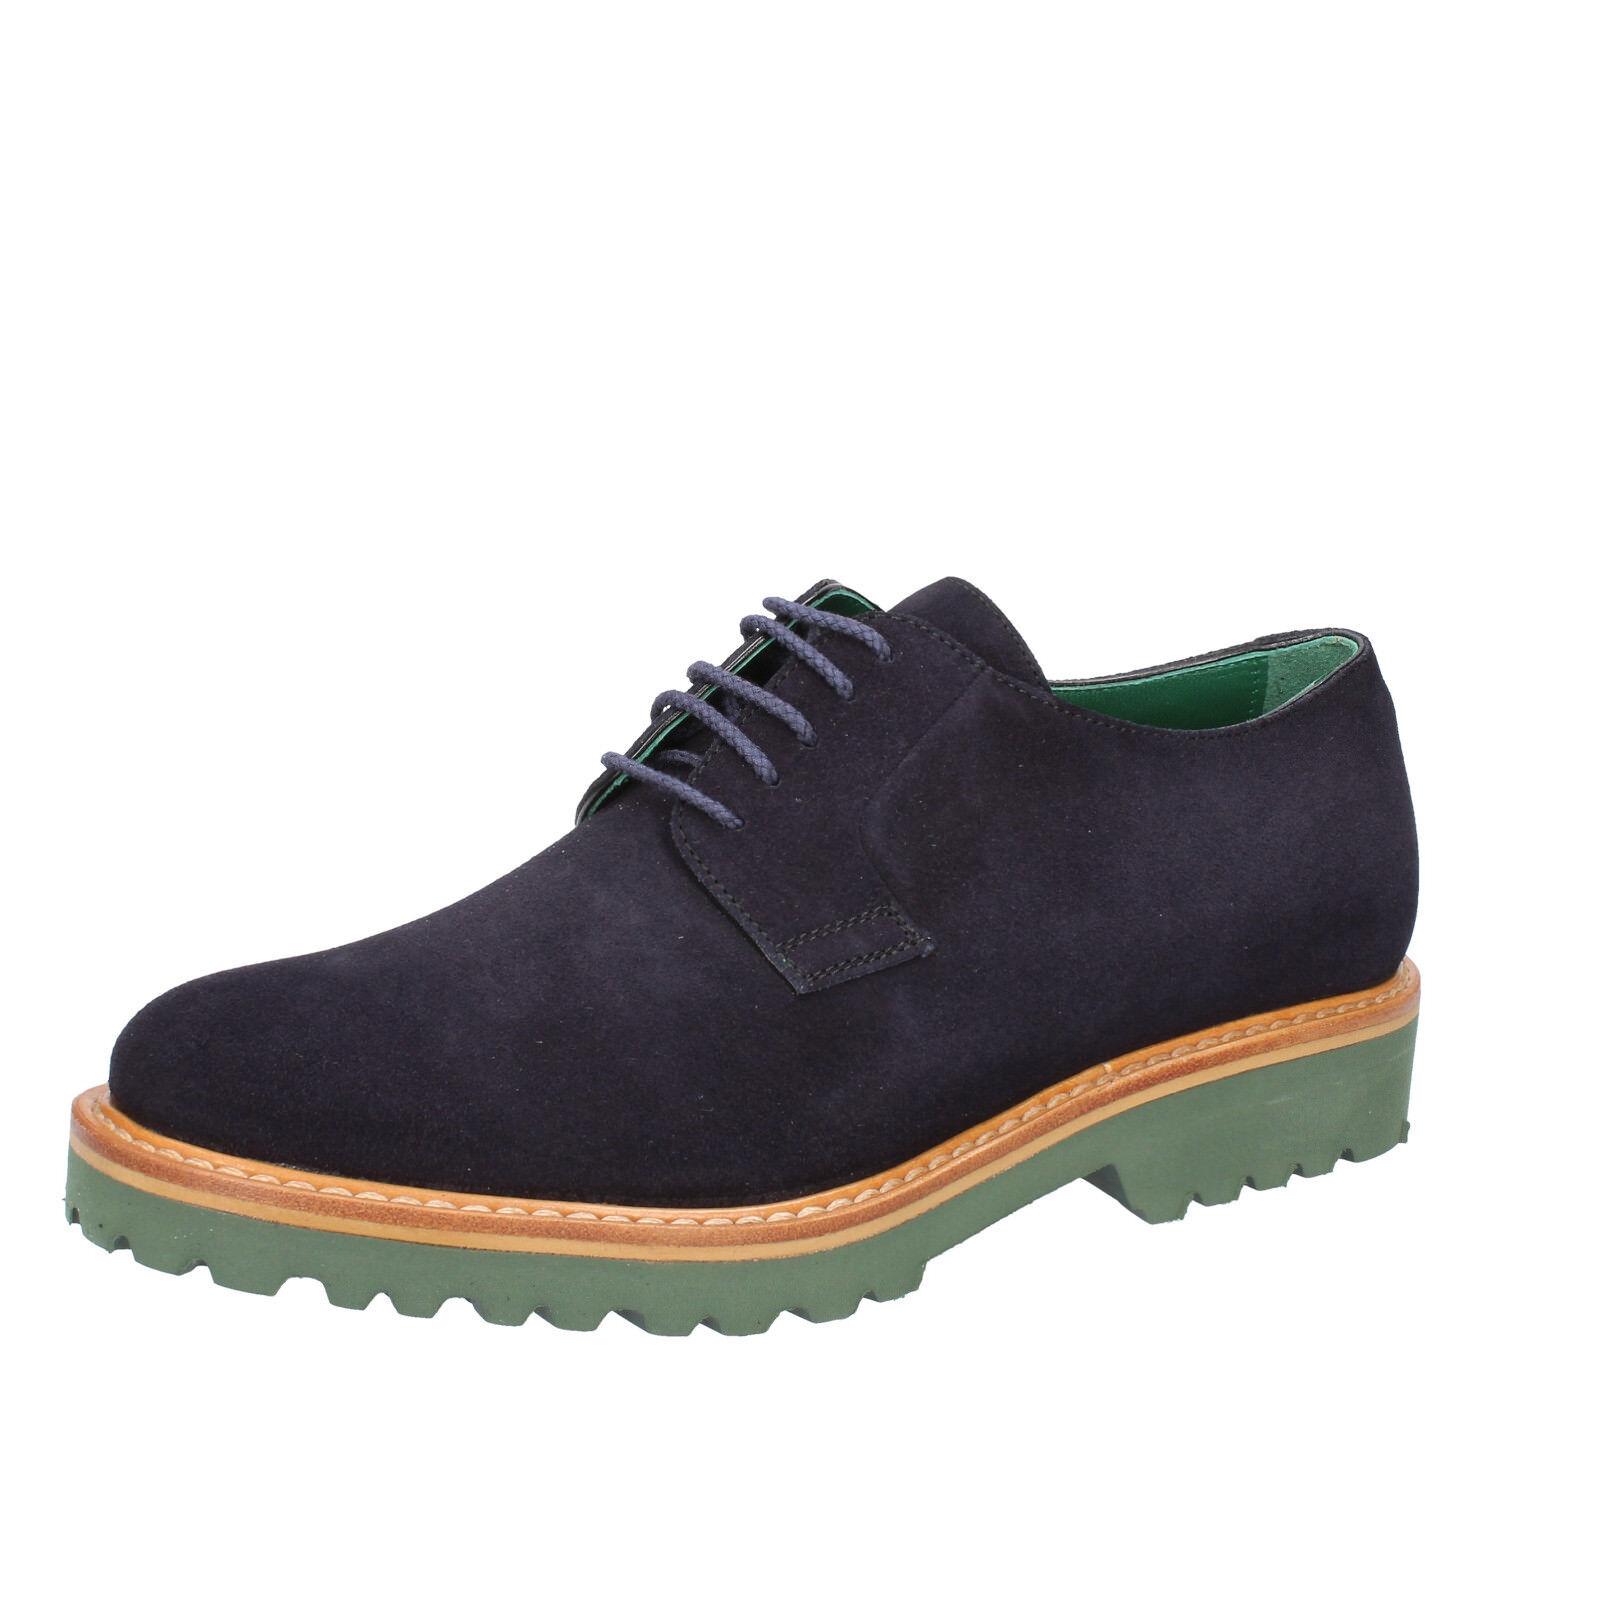 Mens shoes DI MELLA 6,5 (EU 40,5) elegant bluee suede BZ34-C